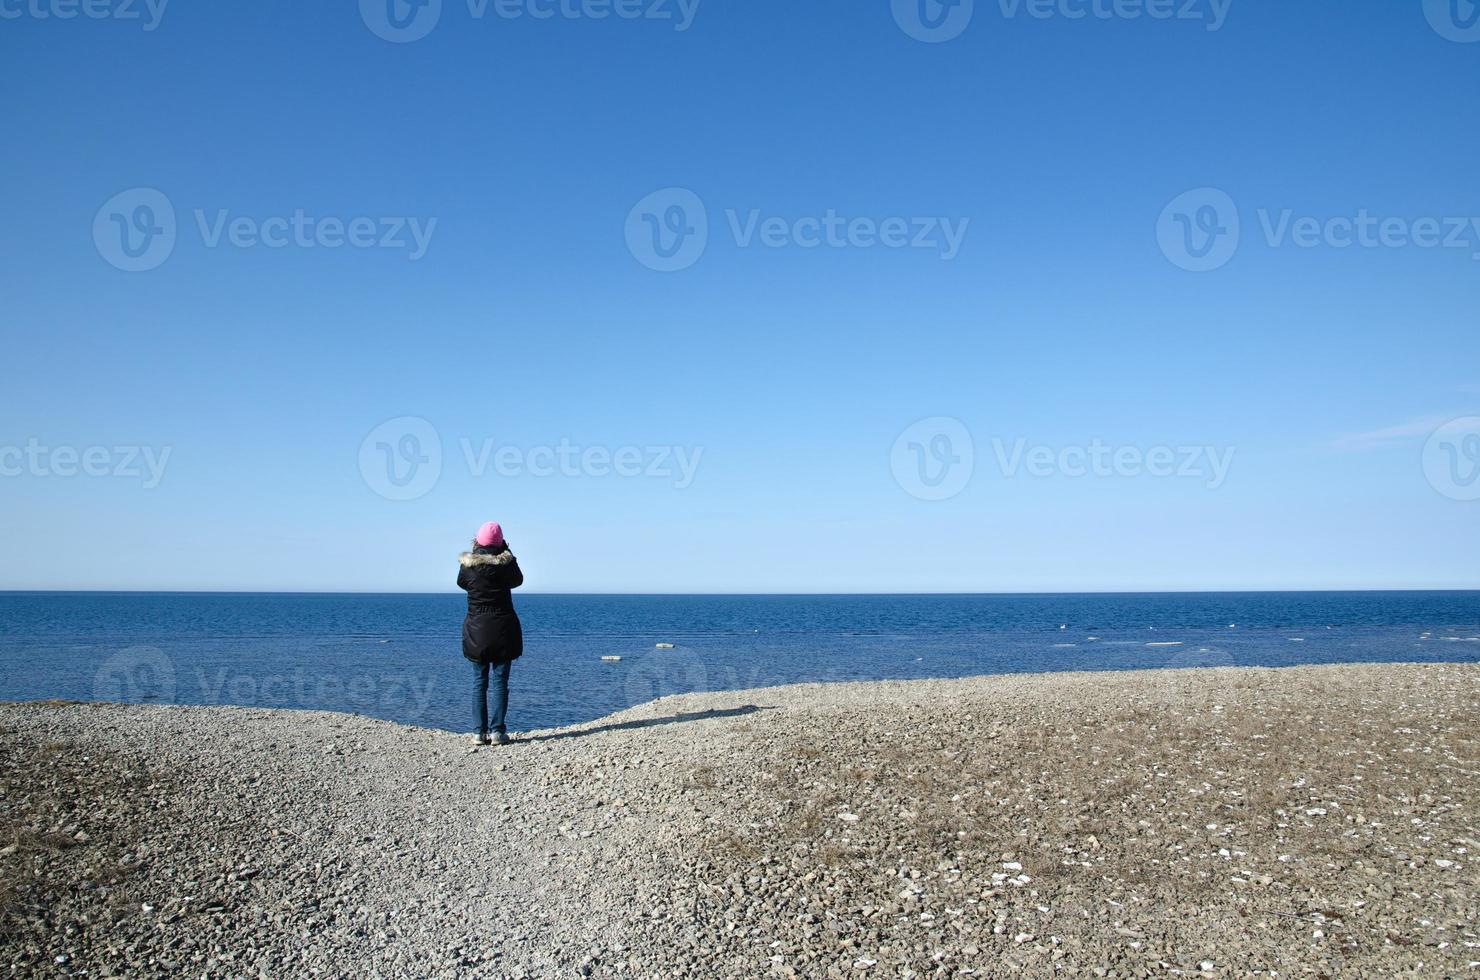 Watching blue sea photo